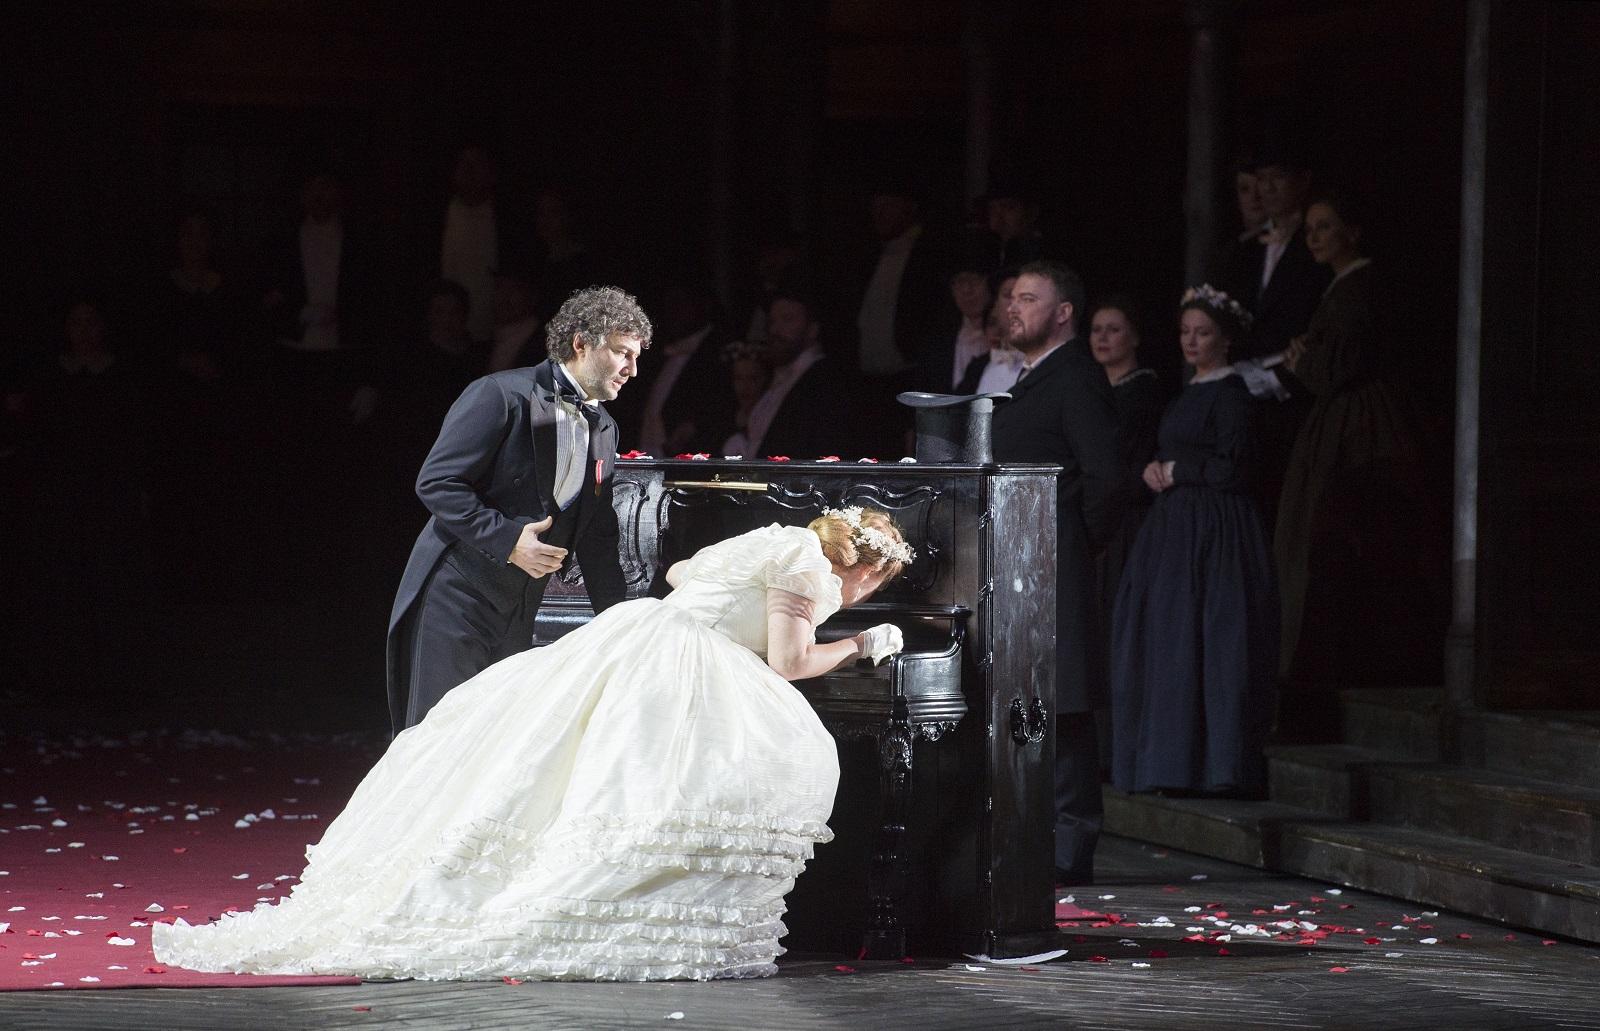 Jonas Kaufmann (Lohengrin) et Martina Serafin (Elsa Von Brabant) (© Monika Rittershaus / Opéra national de Paris)